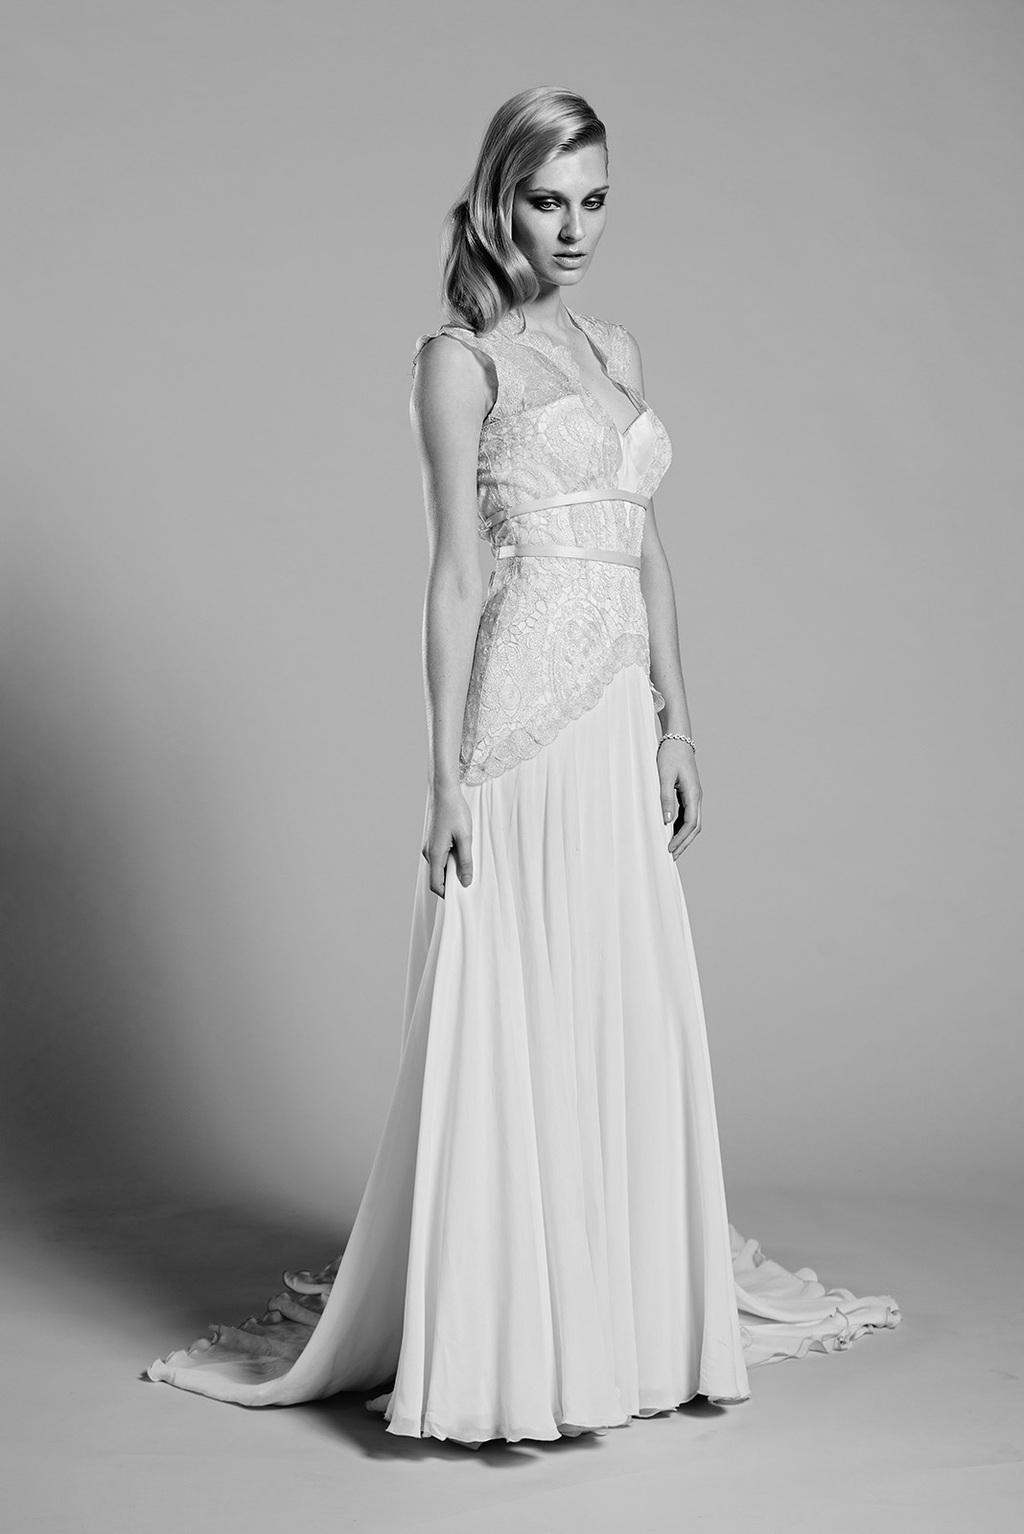 Lilac-wedding-dress-by-mariana-hardwick-2014-bridal.full